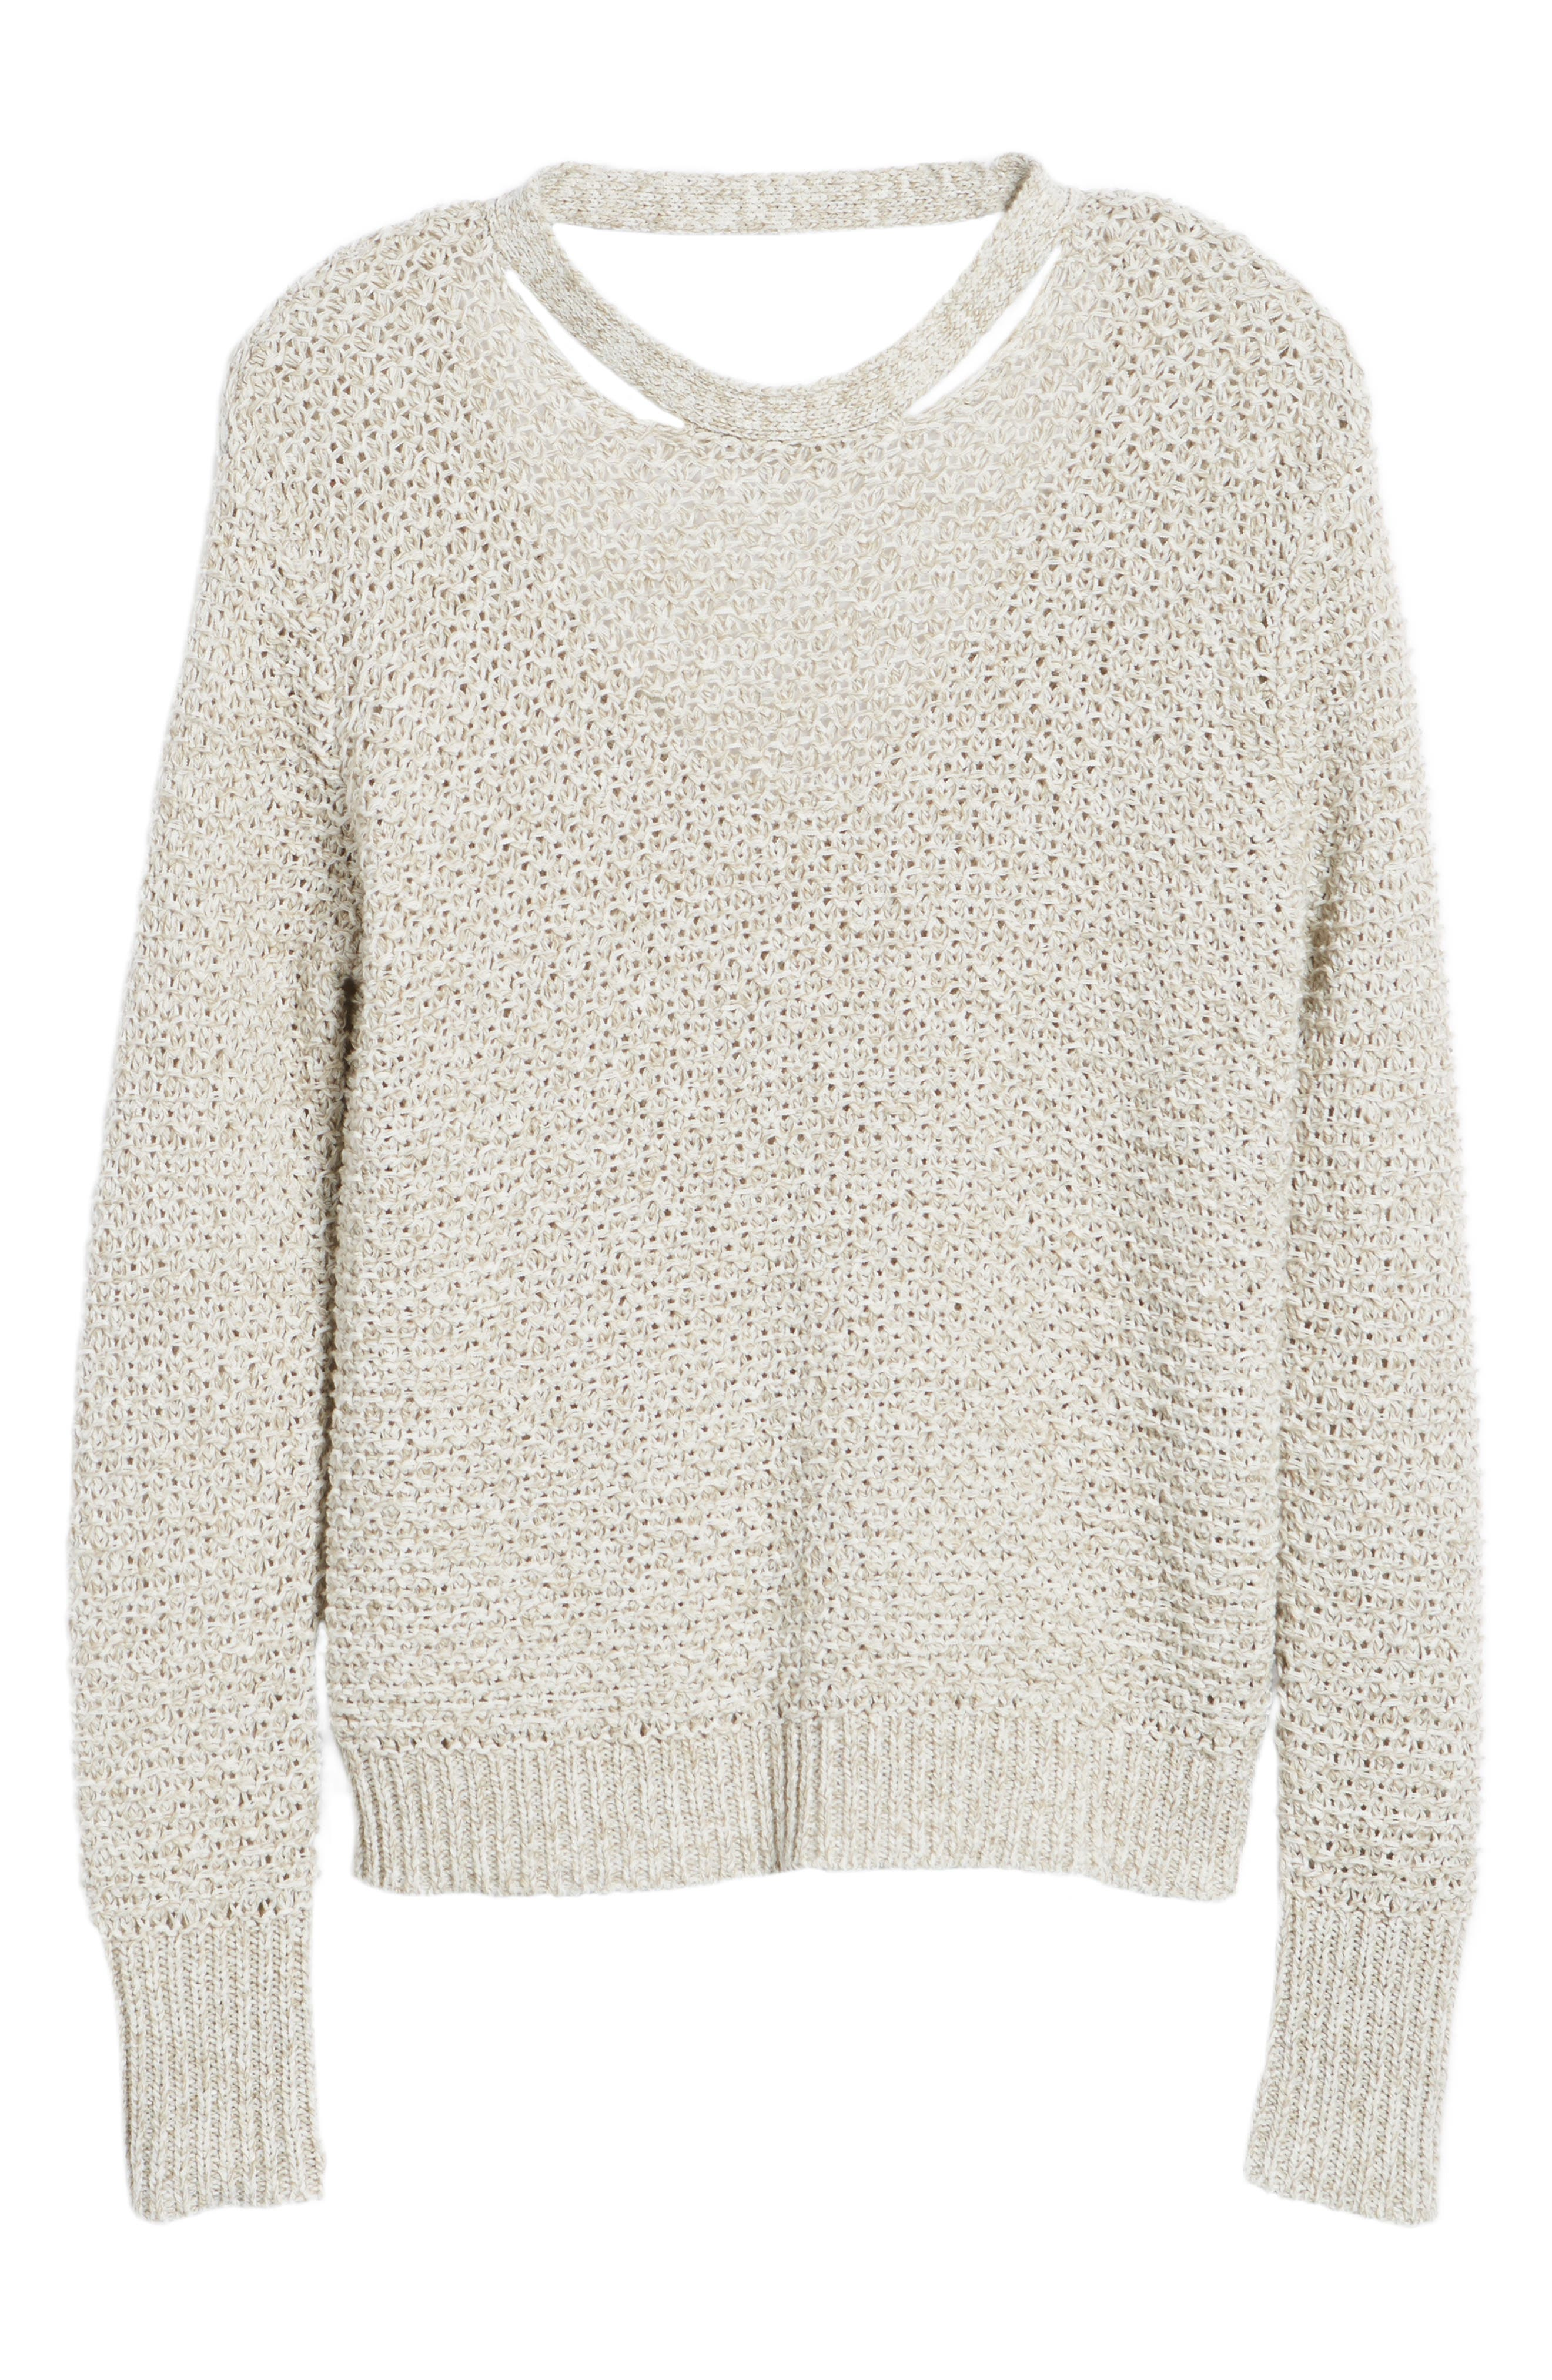 Mélange Open Back Sweater,                             Alternate thumbnail 6, color,                             238